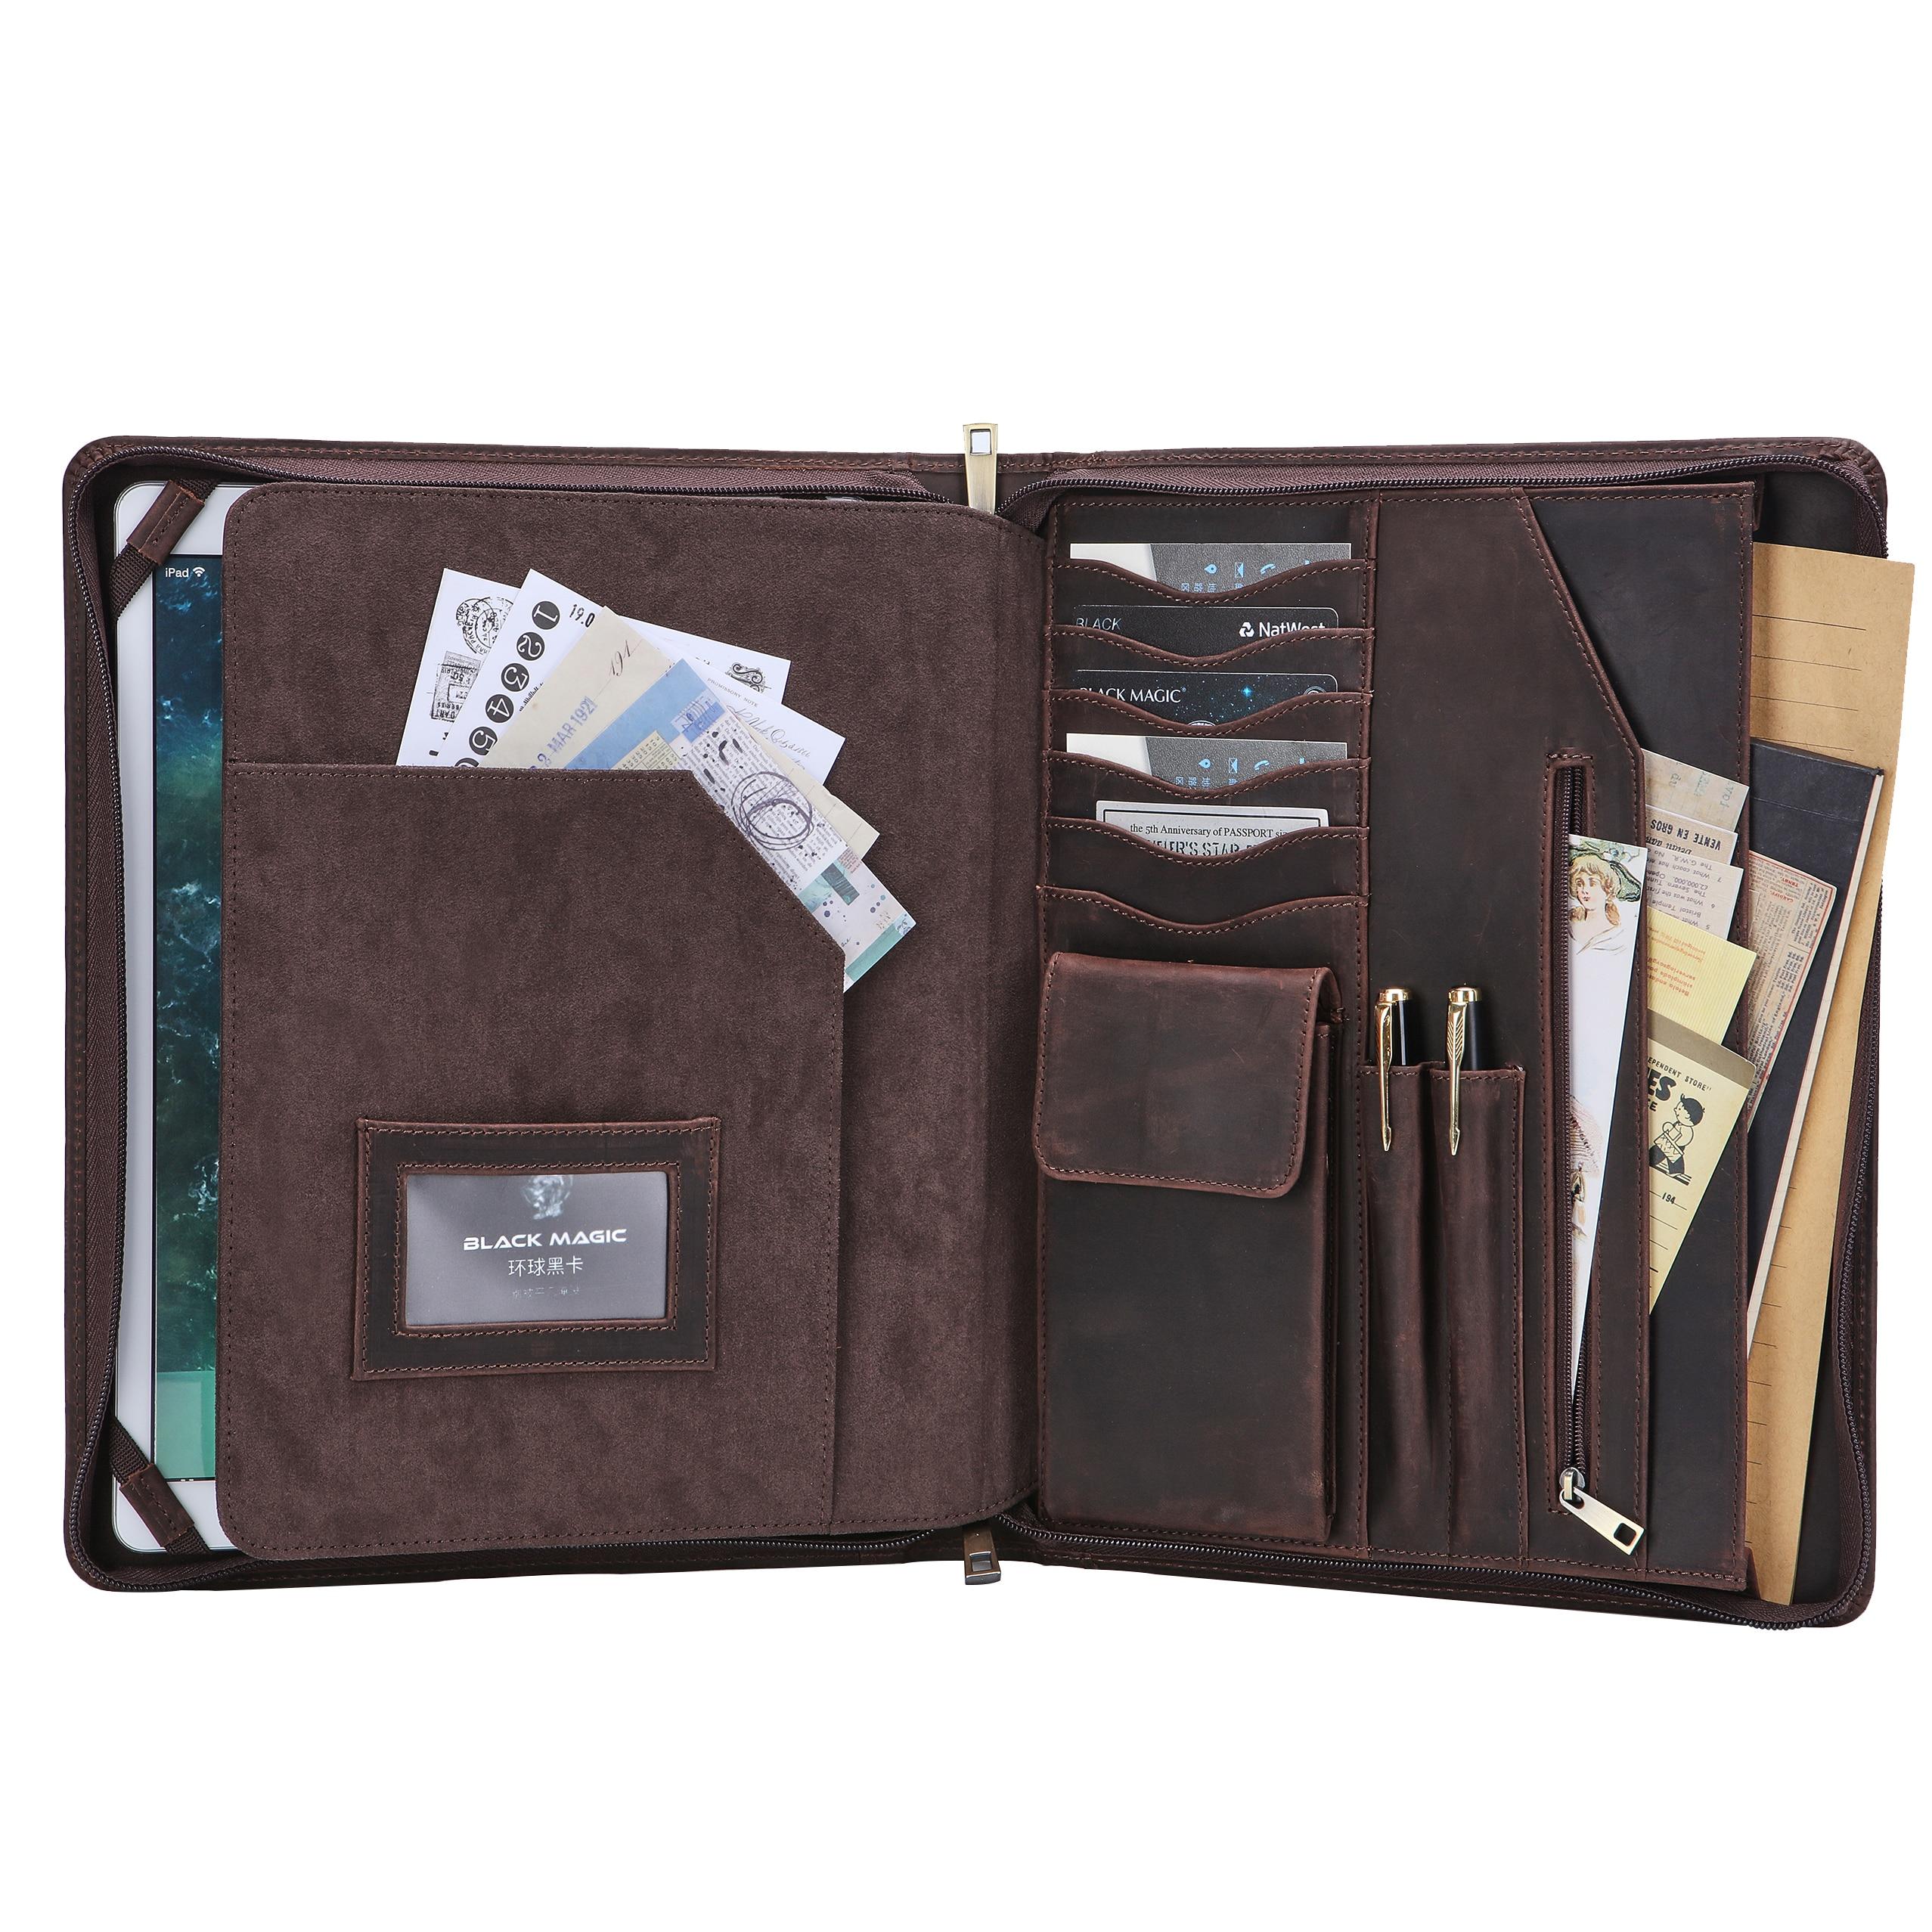 Leather Portfolio Business Organizer Folder Padfolio Executive Case Document Bag